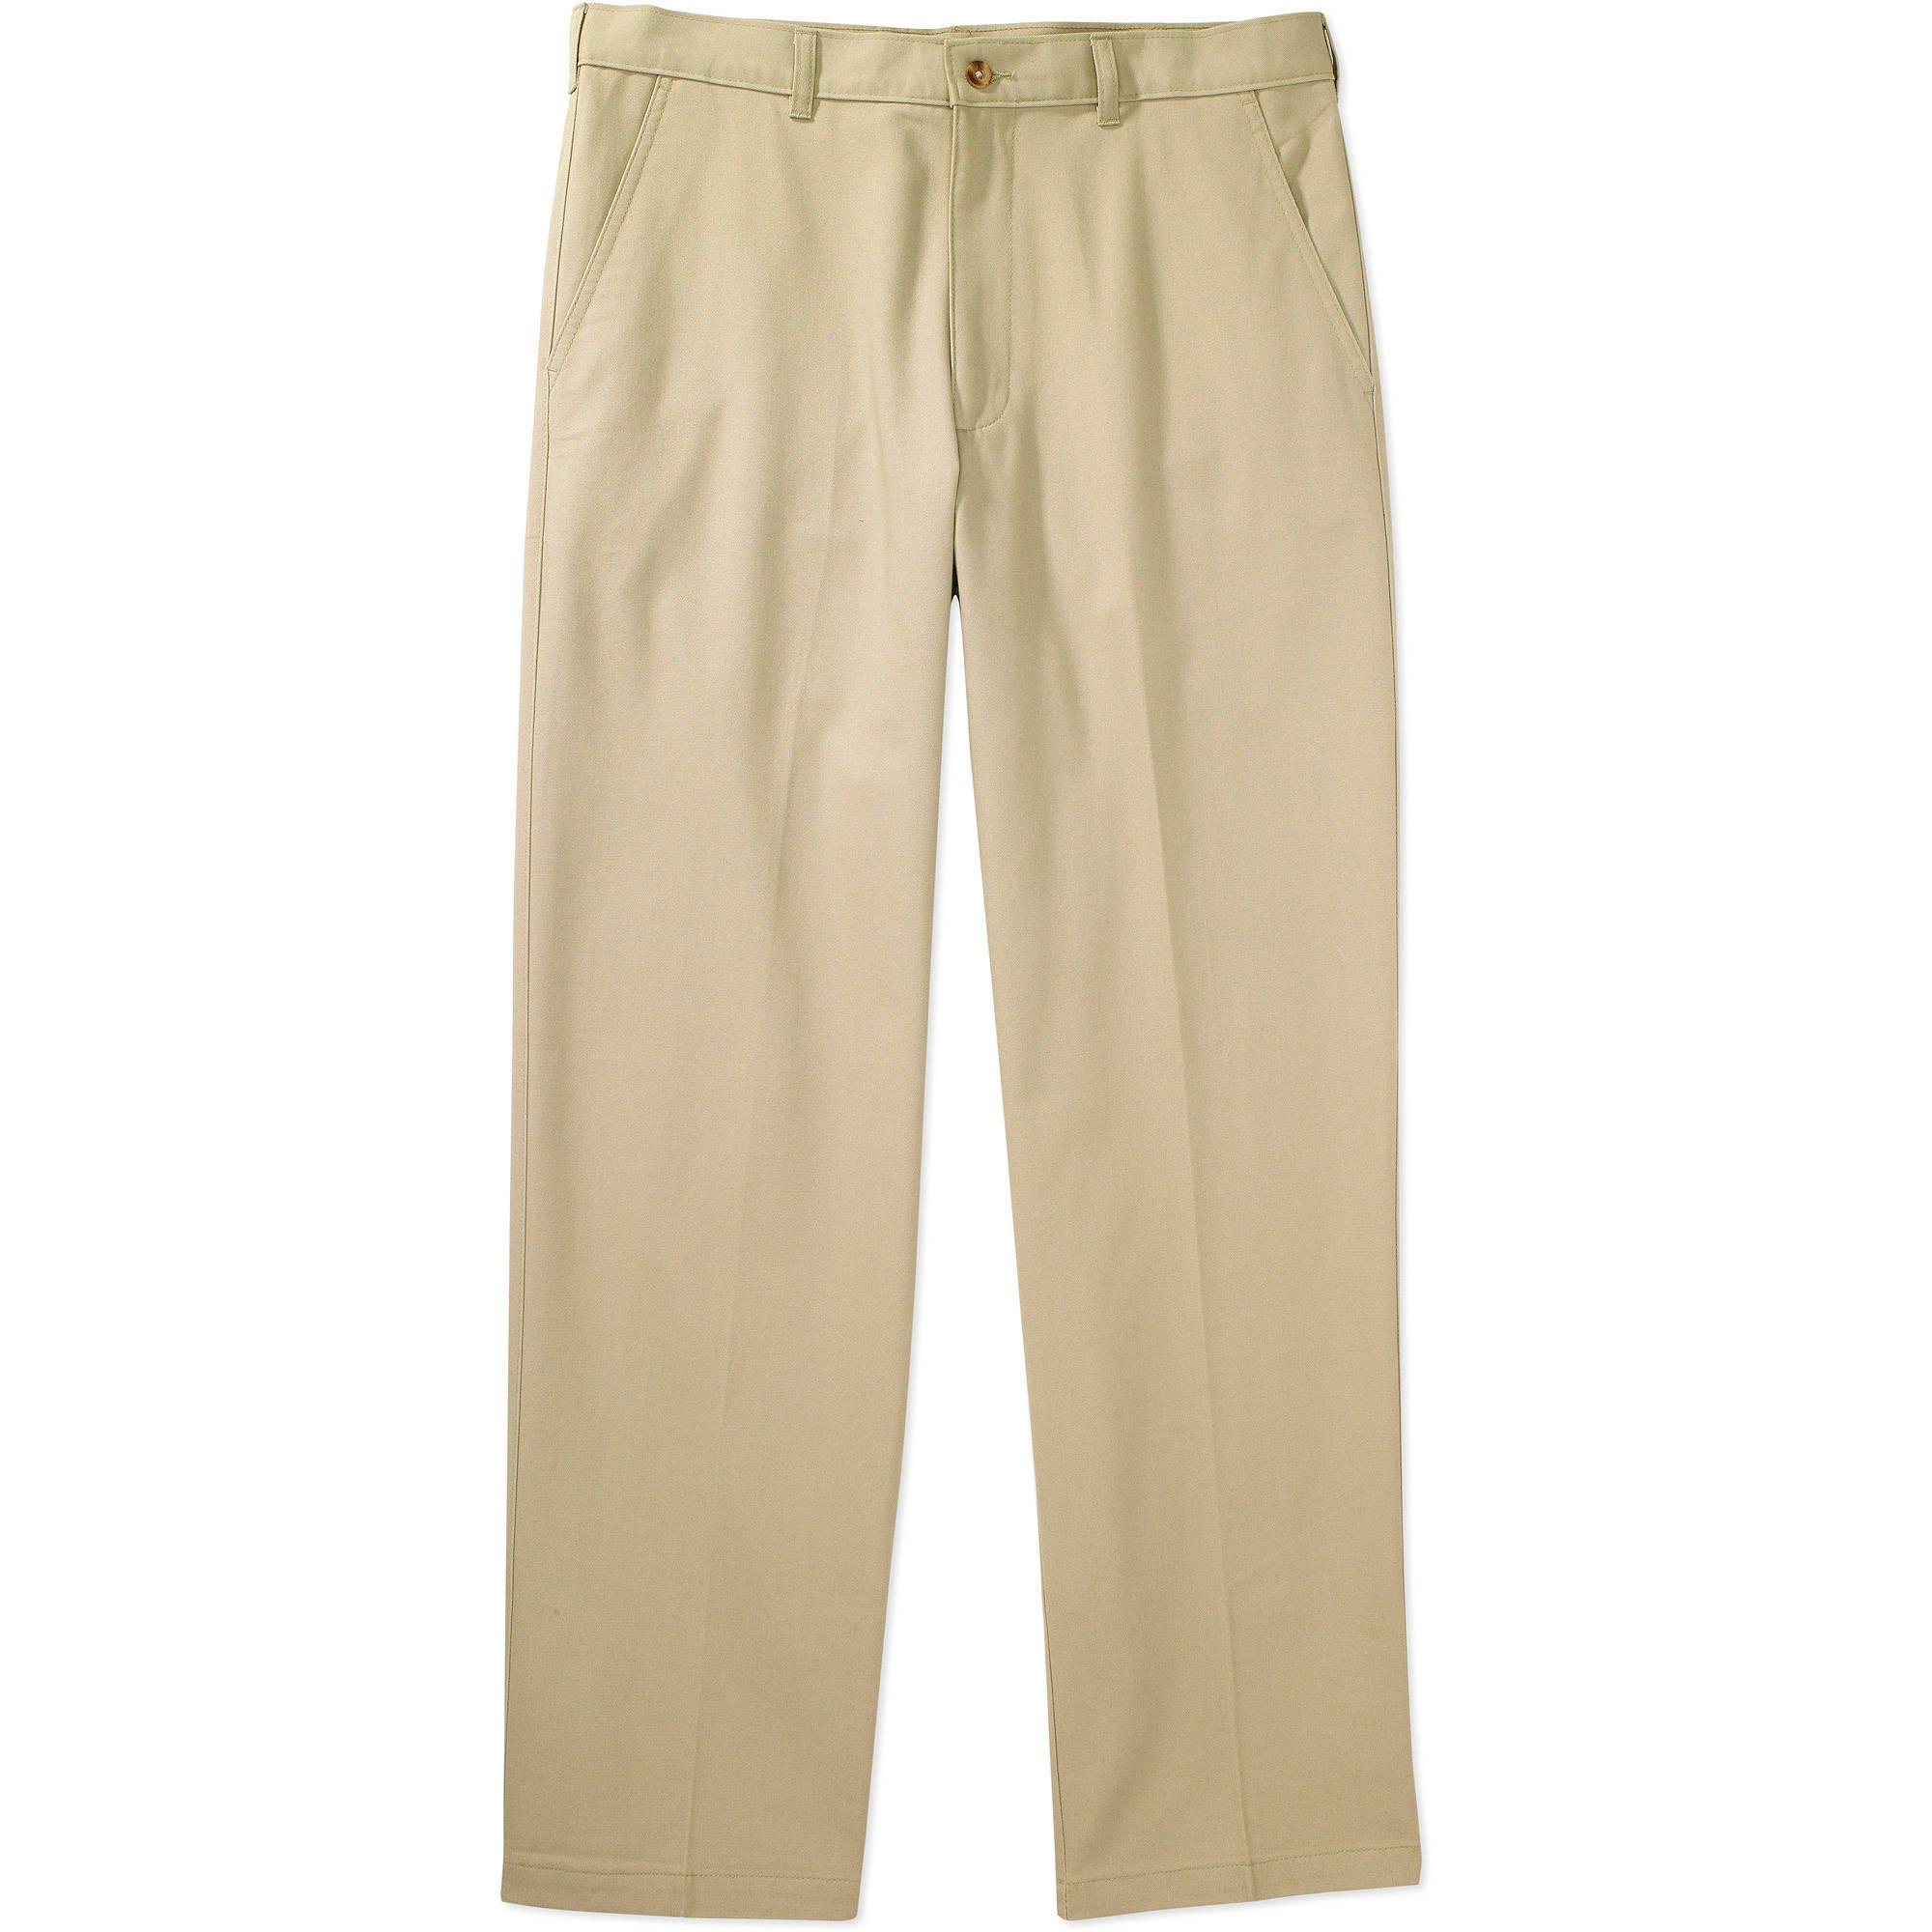 George Men's Flat-Front Wrinkle-Resistant Pants